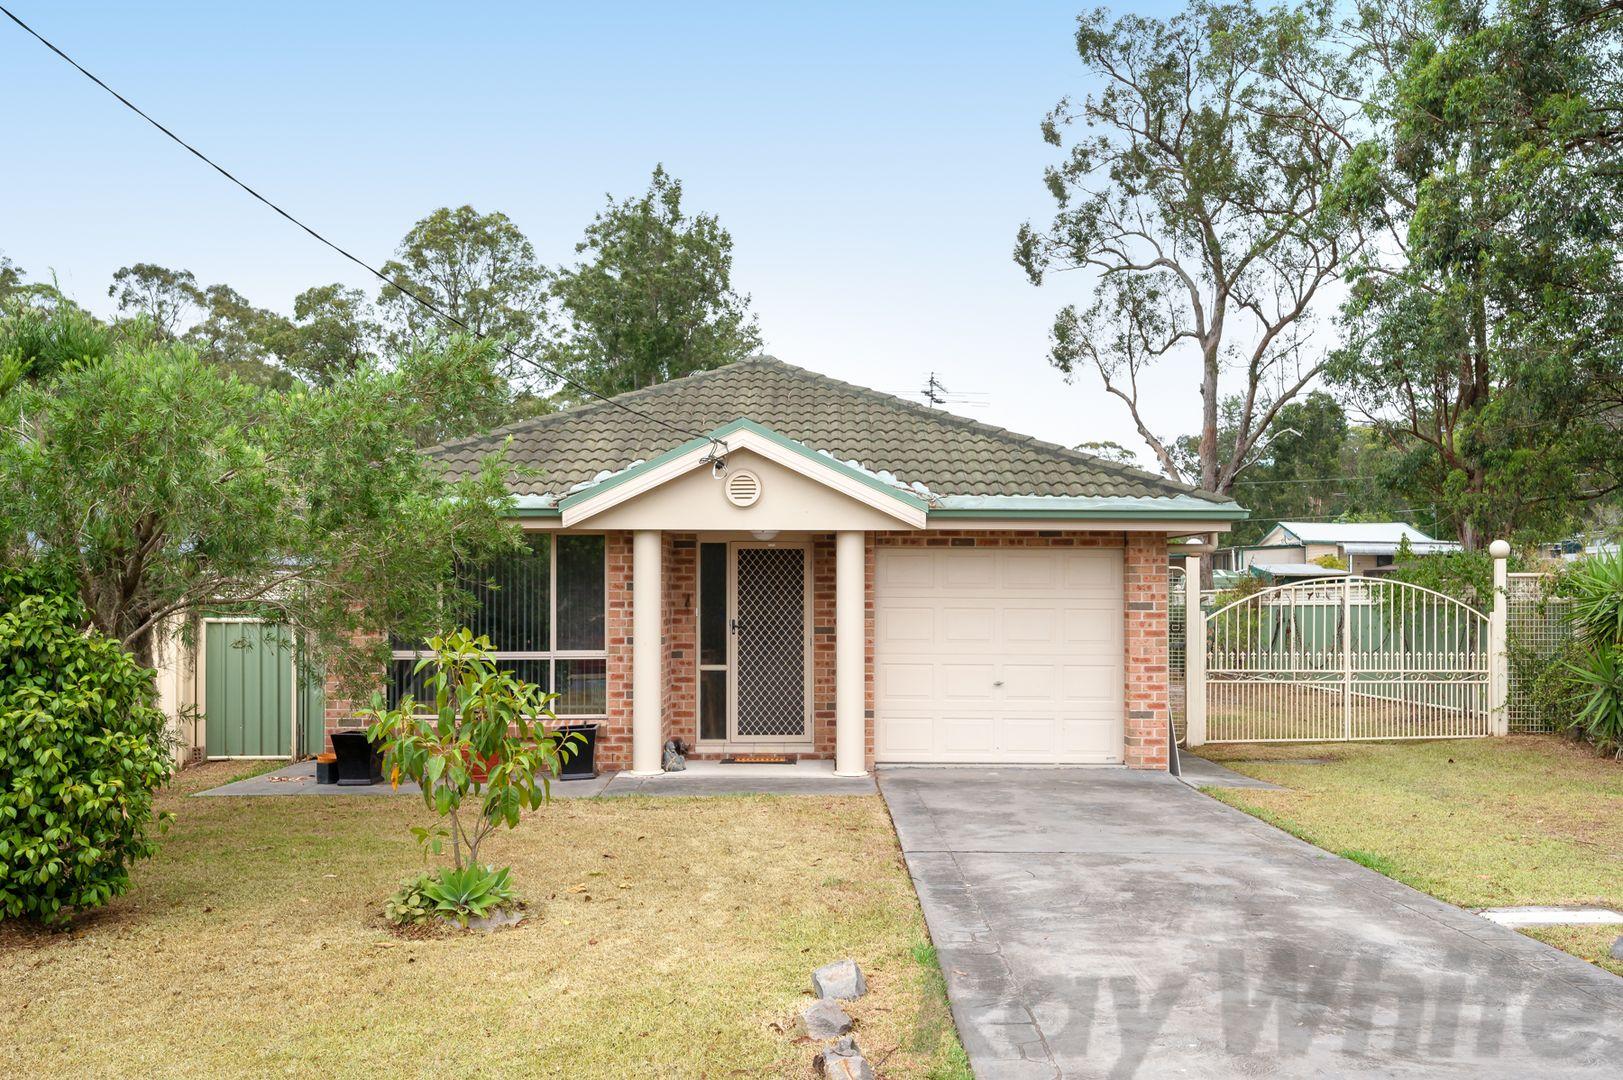 9 Stroud Street, Allworth Via, Stroud NSW 2425, Image 0